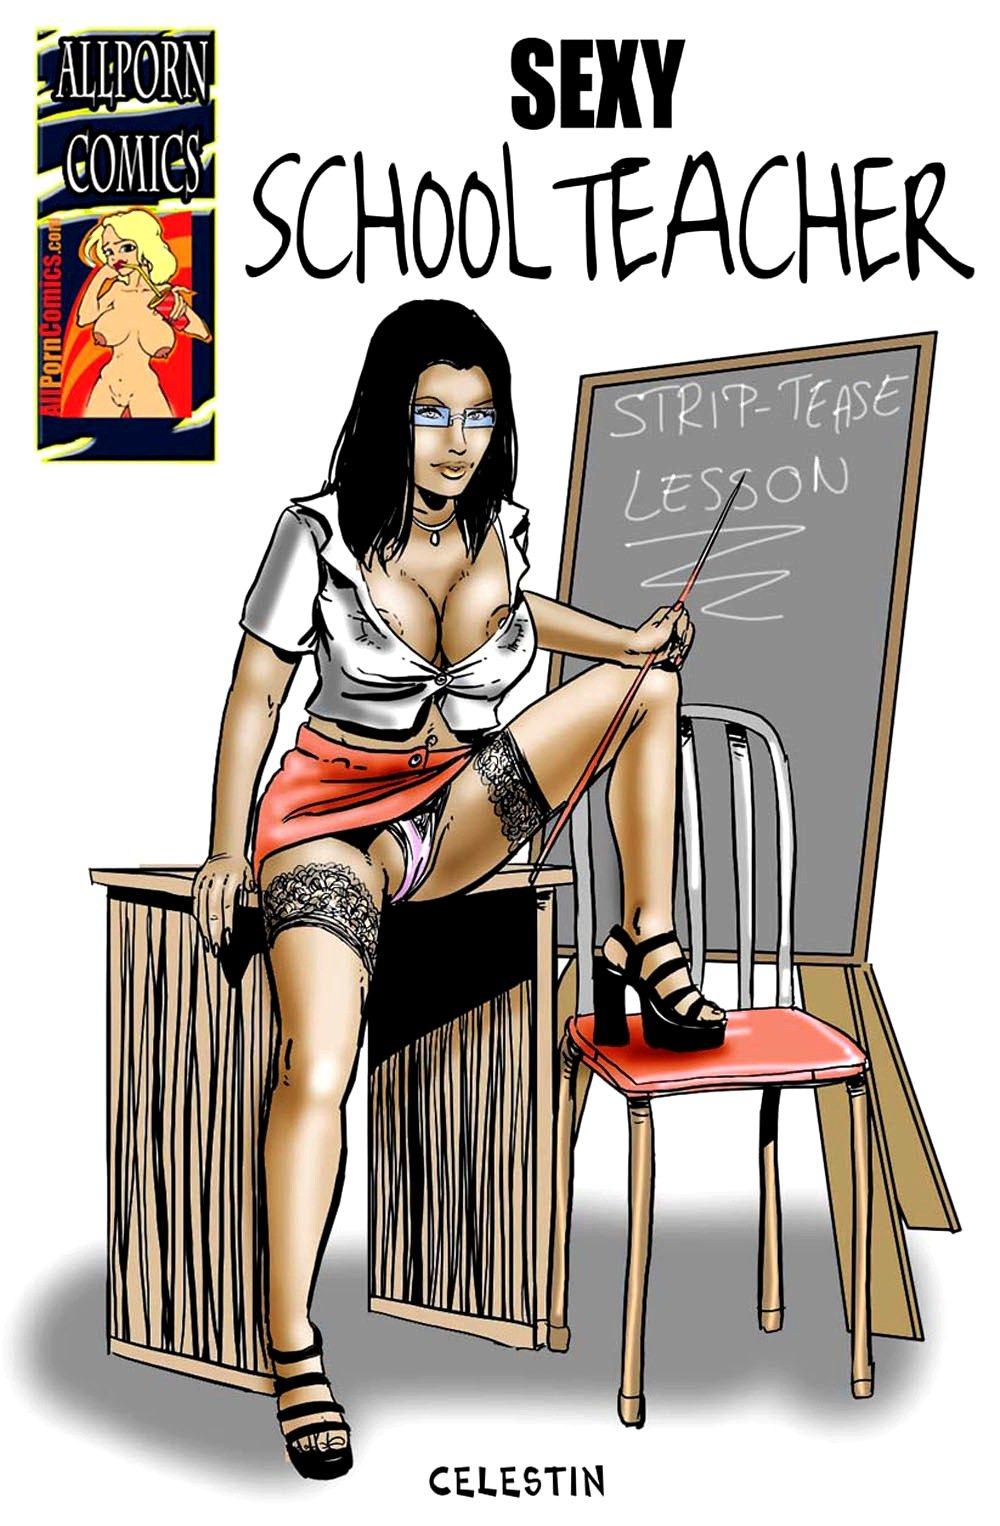 Porn Comics - Celestin-Sexy School Teacher AllPorn porn comics 8 muses